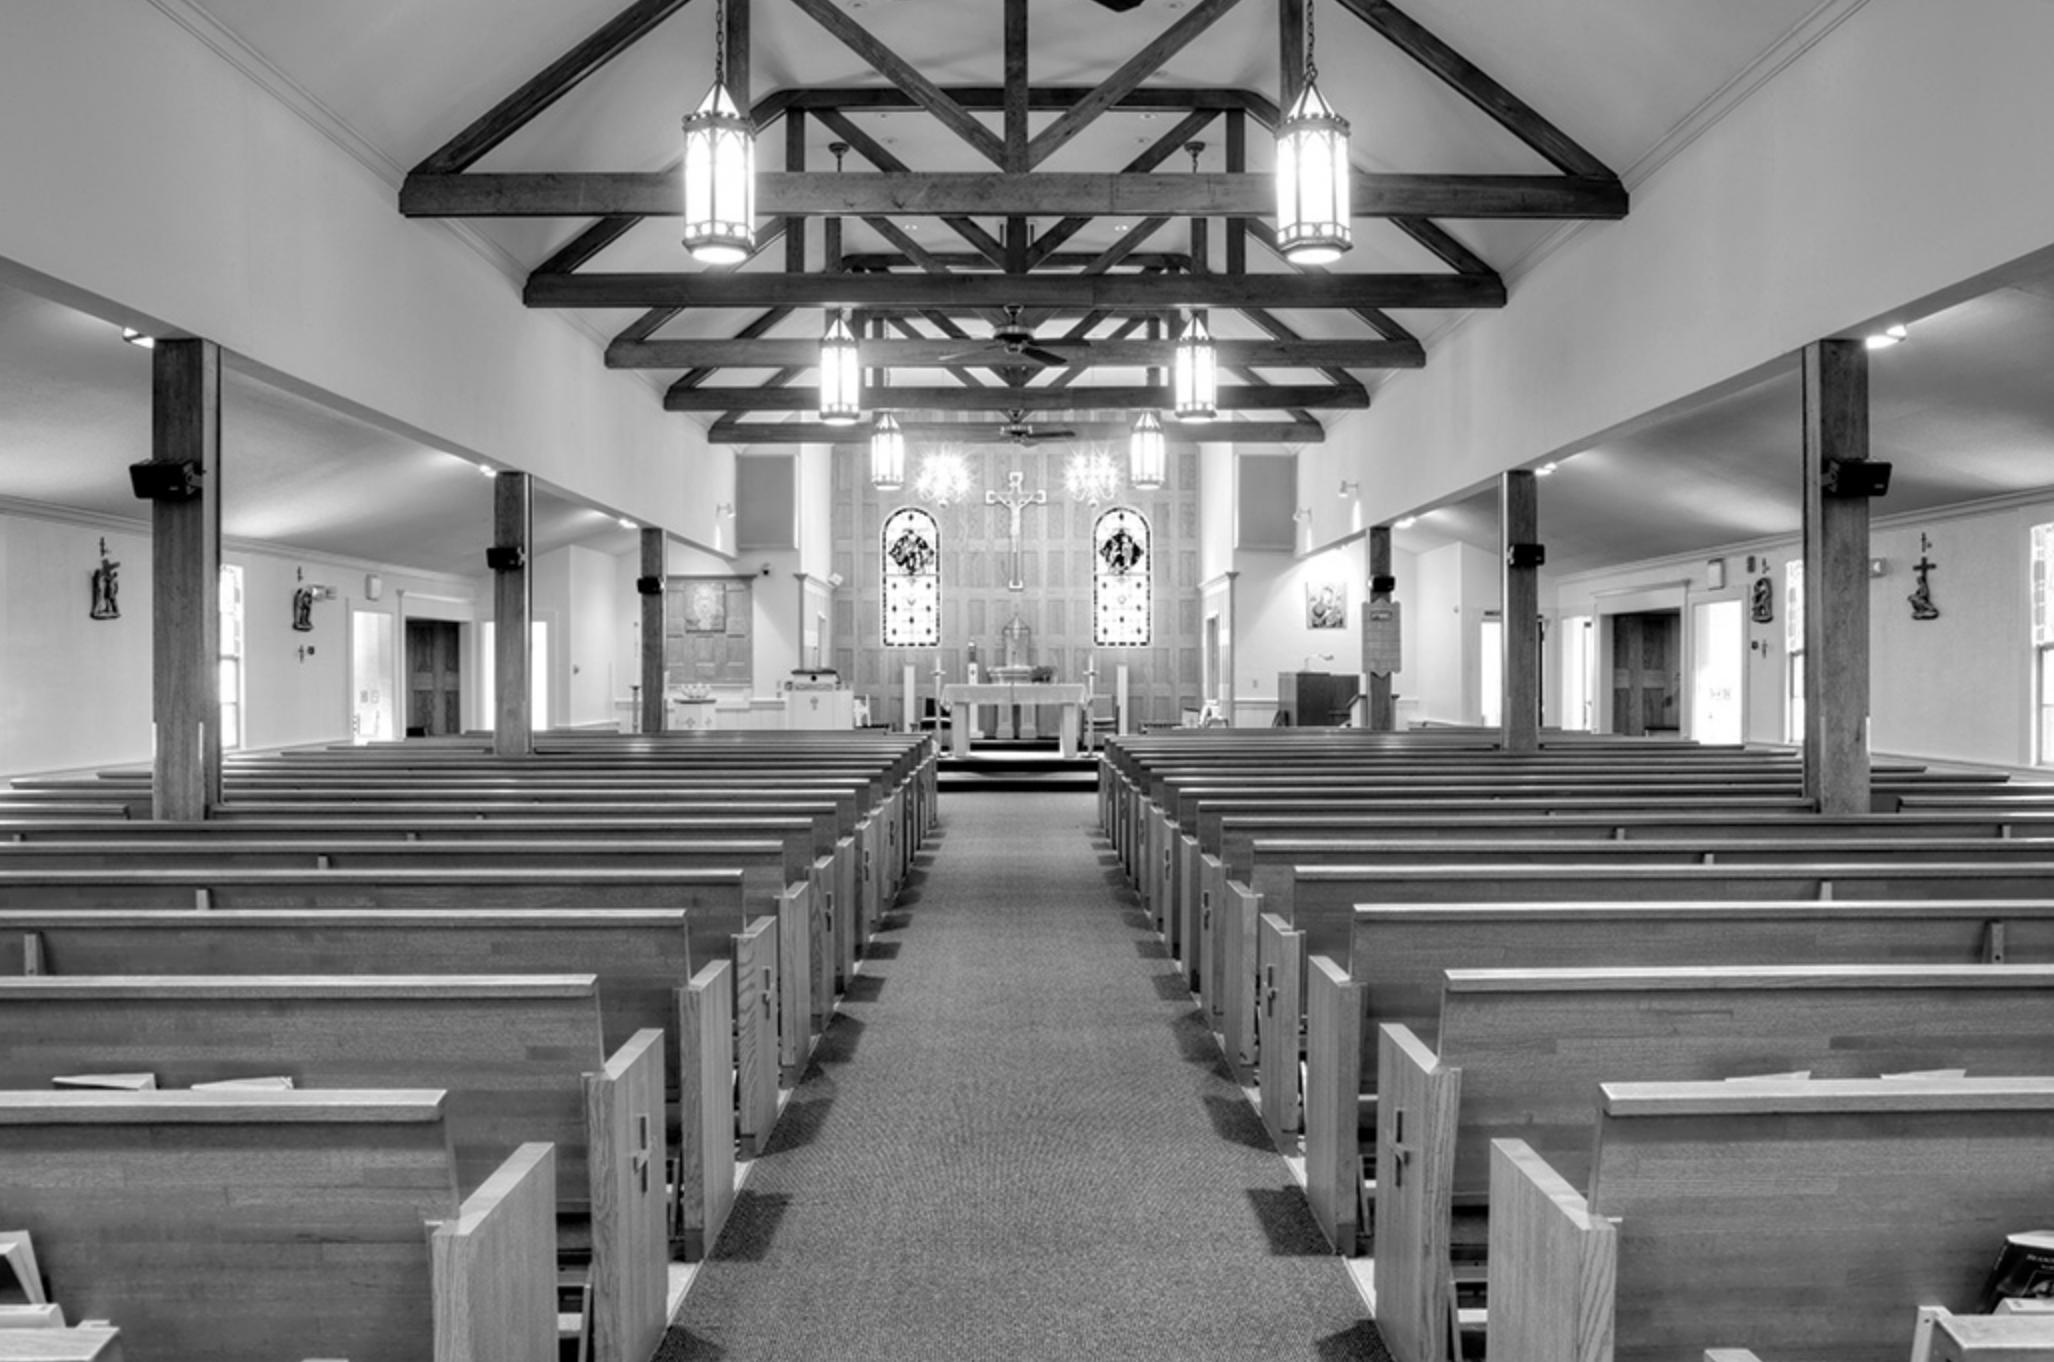 Holy Redeemer church, chatham, MA